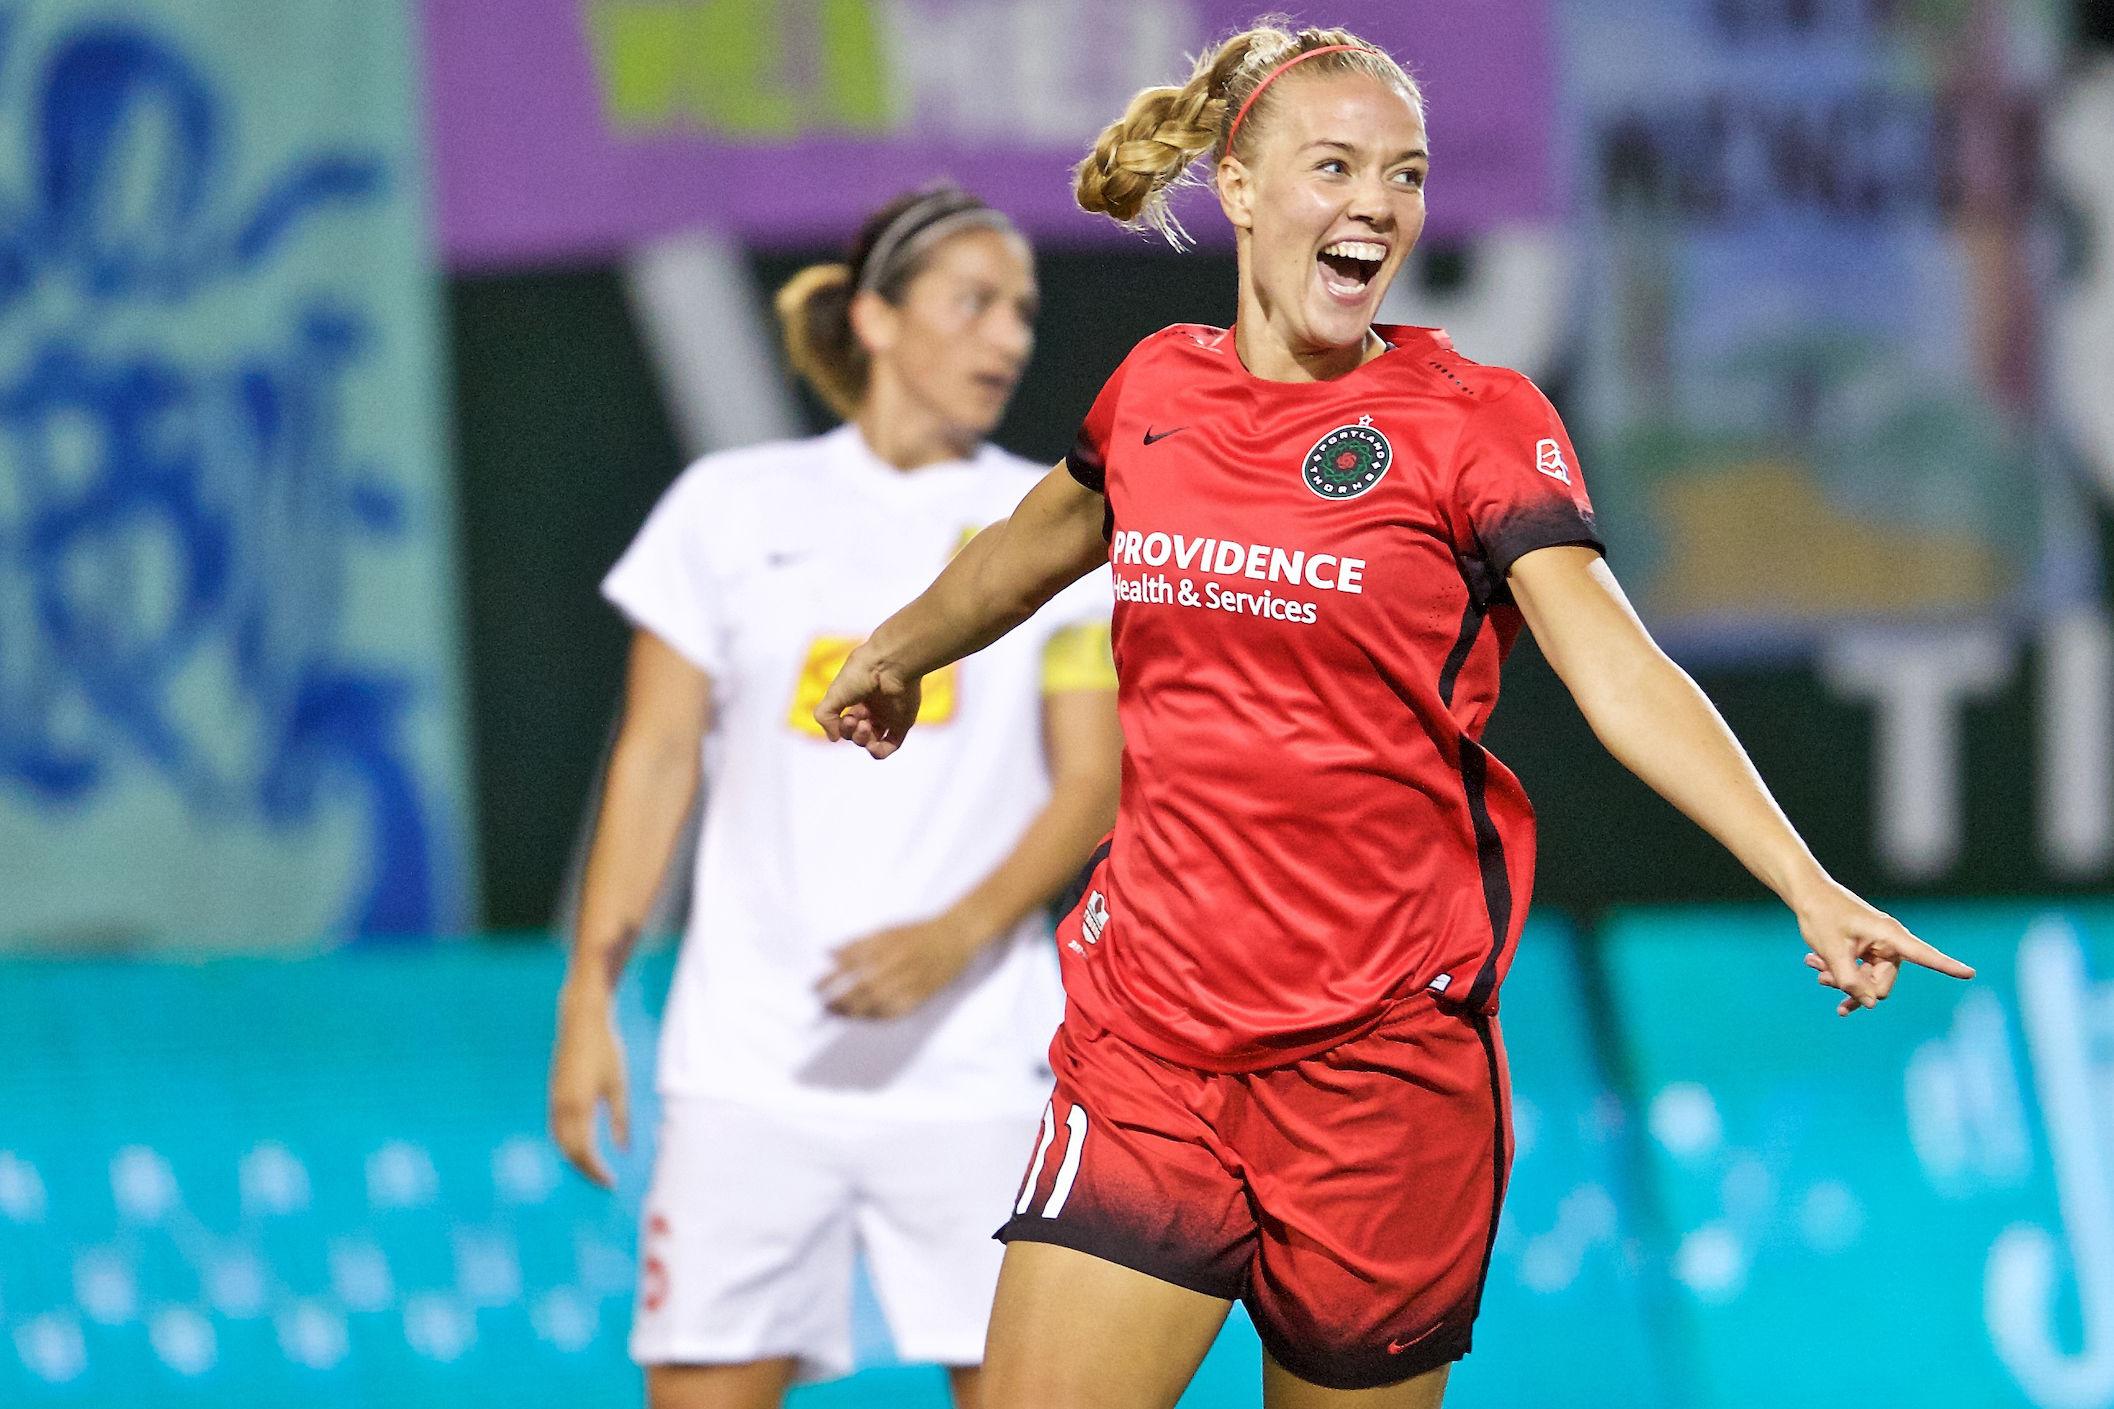 Dagny brynjarsdottir celebrates game winning goal lrhiku